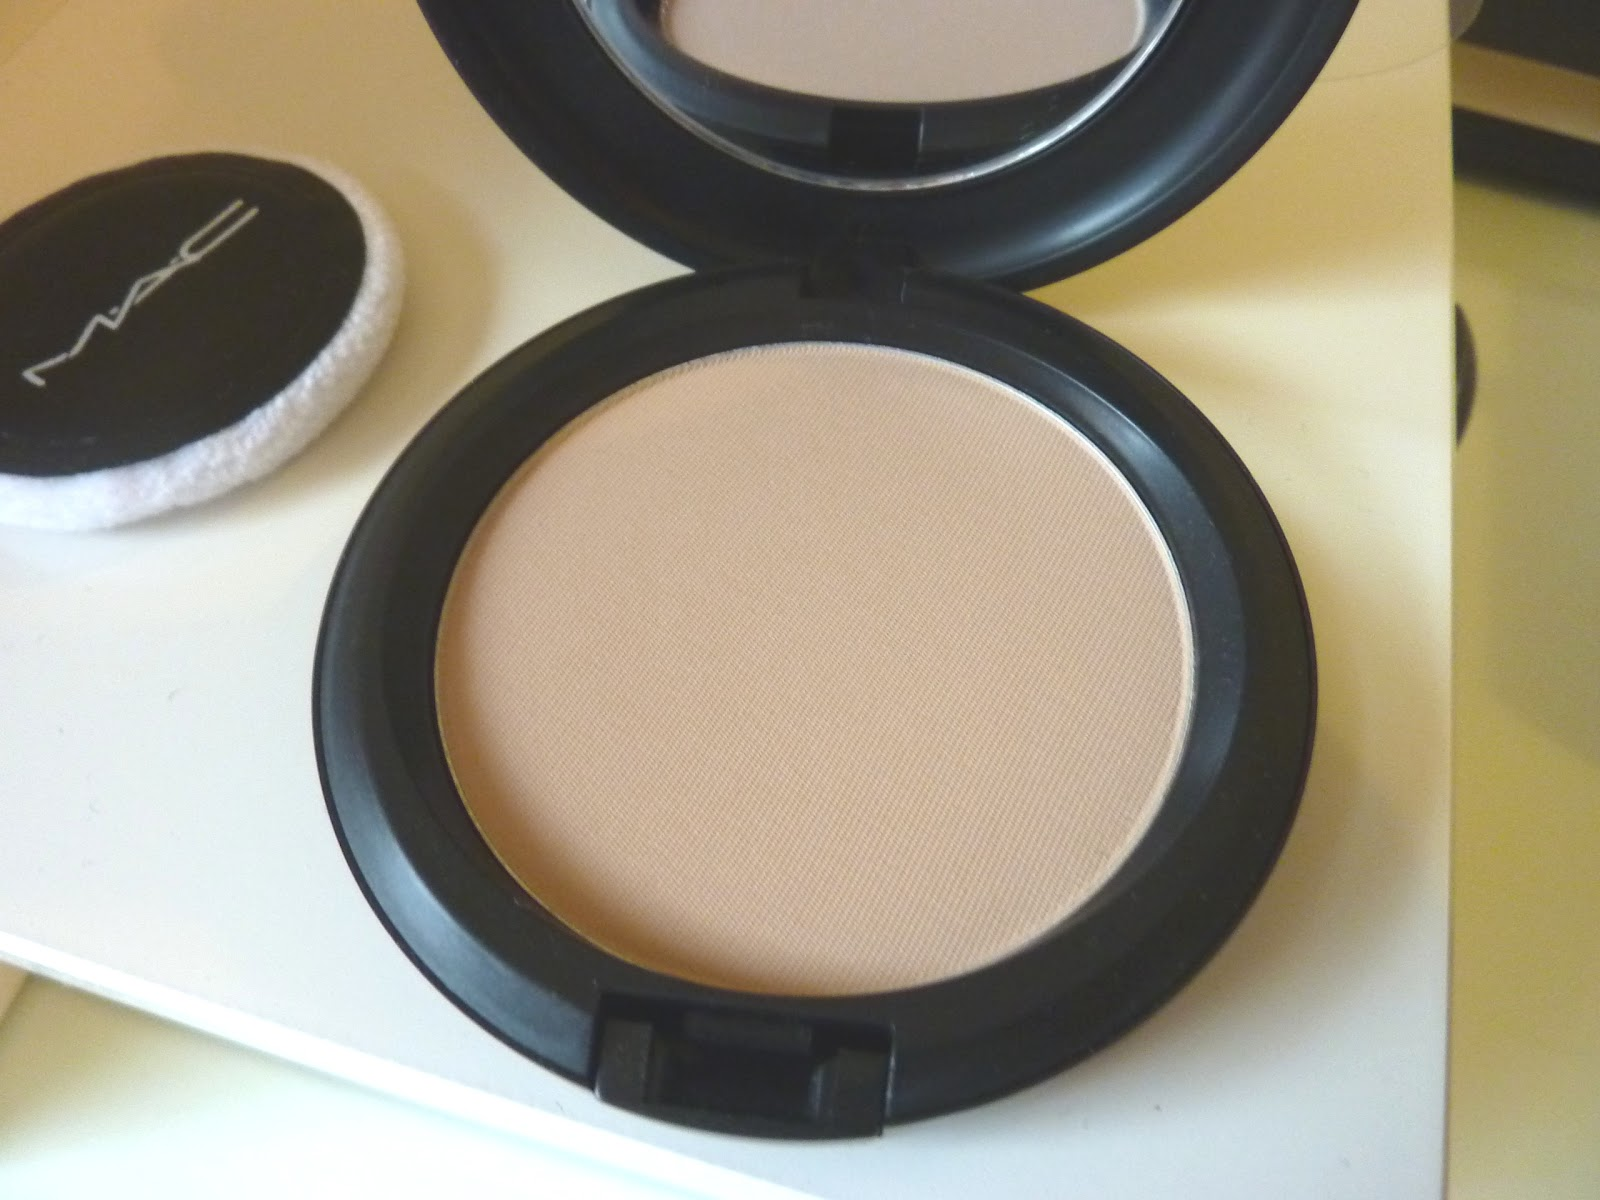 BEAUTY & LE CHIC: Beauty Saviour: MAC Blot Powder